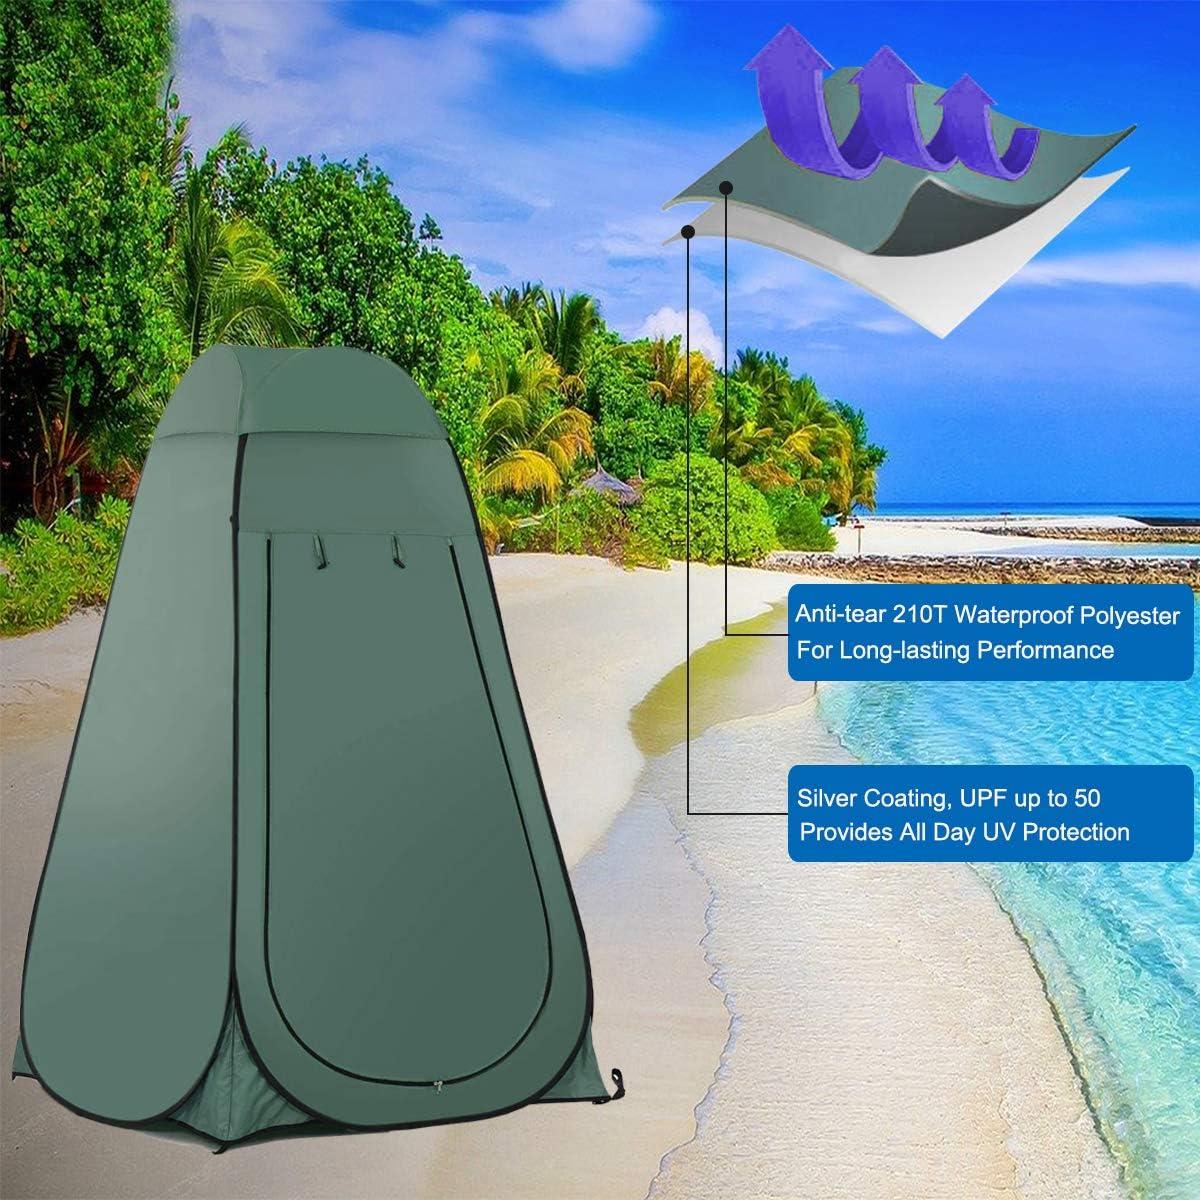 AQOTER Tienda de Campa/ña Tent Abrir Cerrar Autom/áticamente Pop Up Portable Sirve para Camping